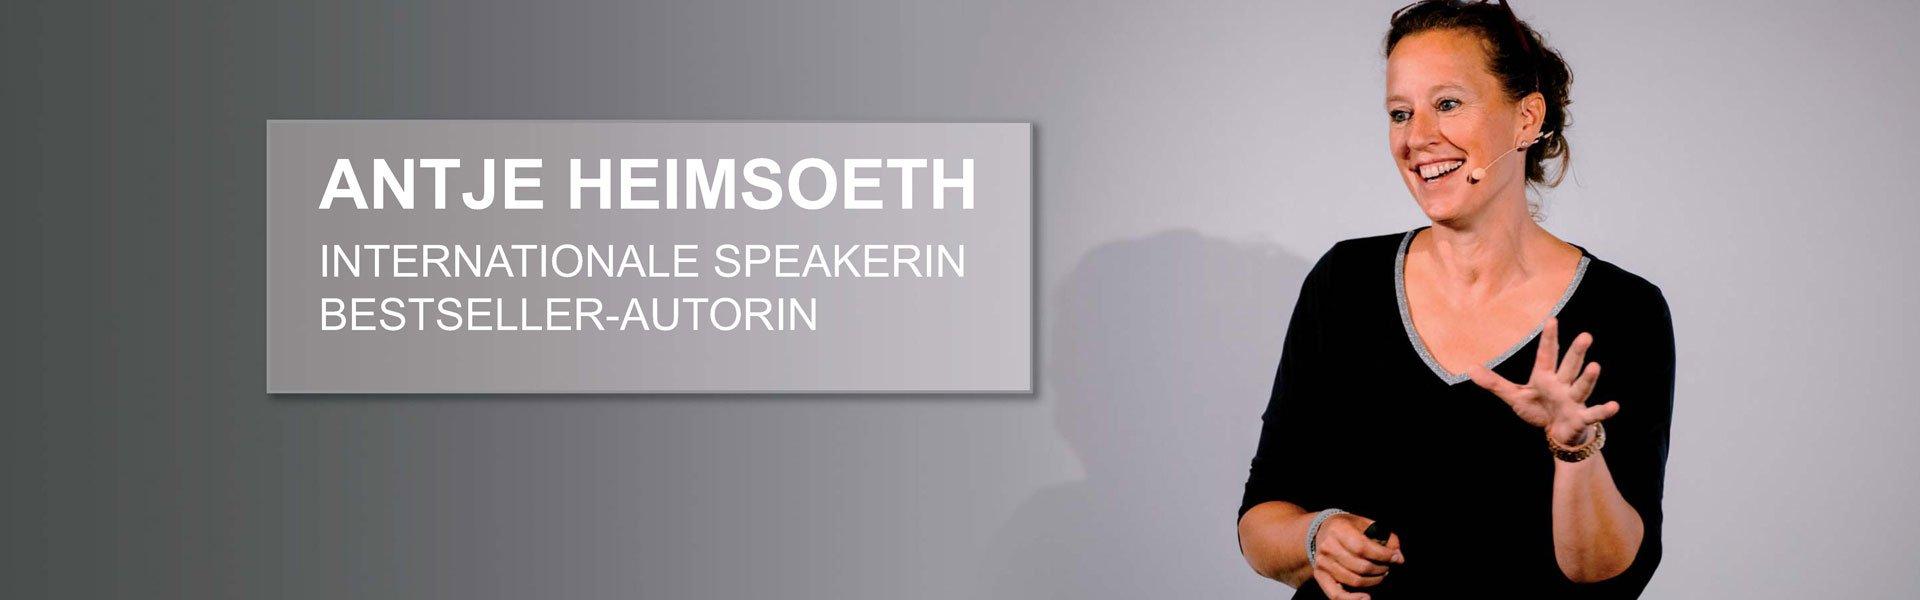 Antje Heimsoeth - Internationale Speakerin - Bestseller-Autorin